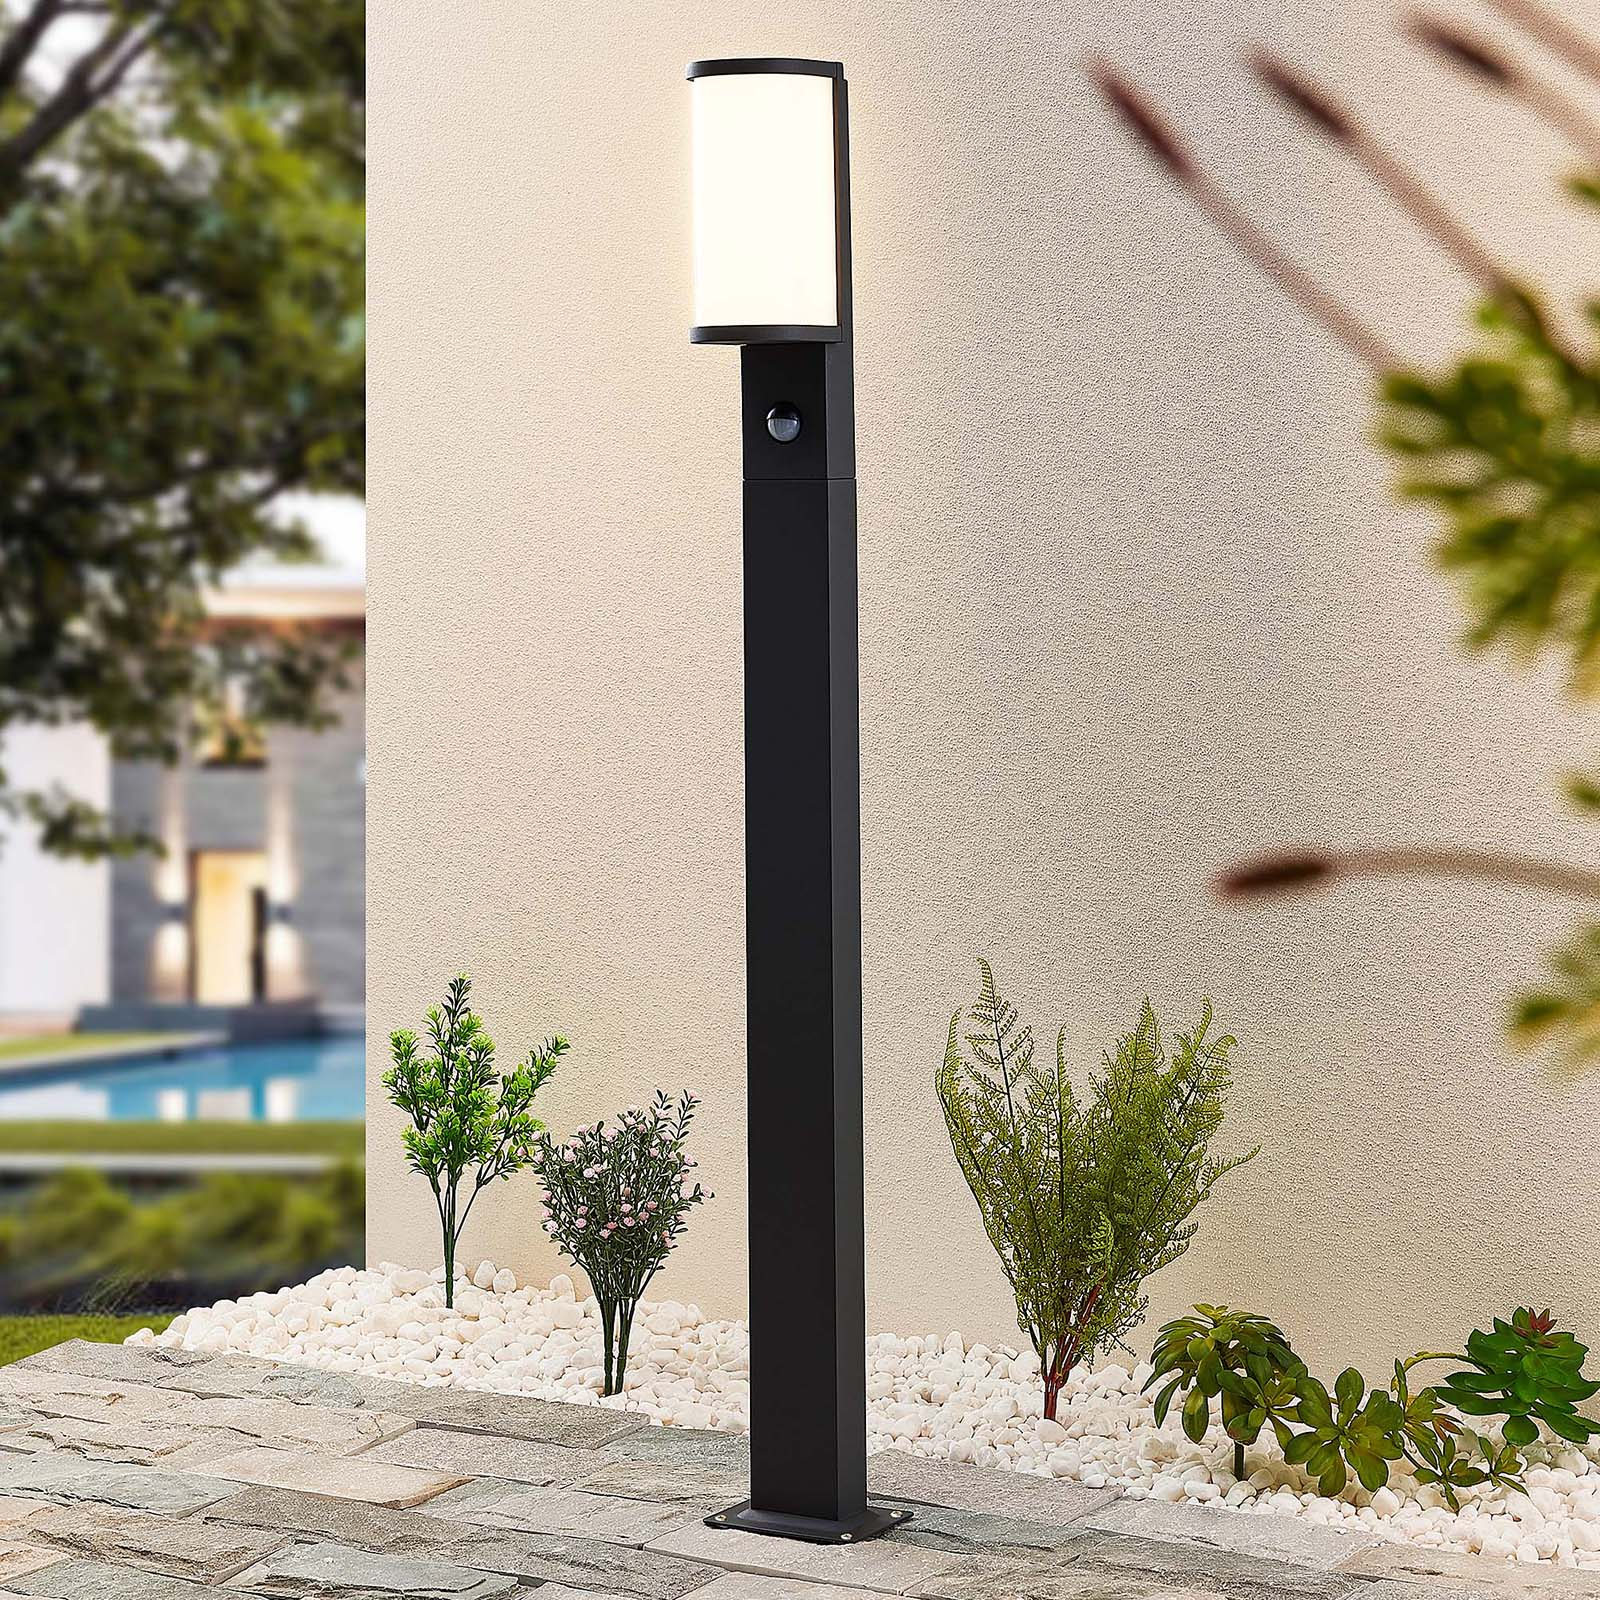 Lucande Jokum LED-Wegelampe, IP54, 100 cm, Sensor